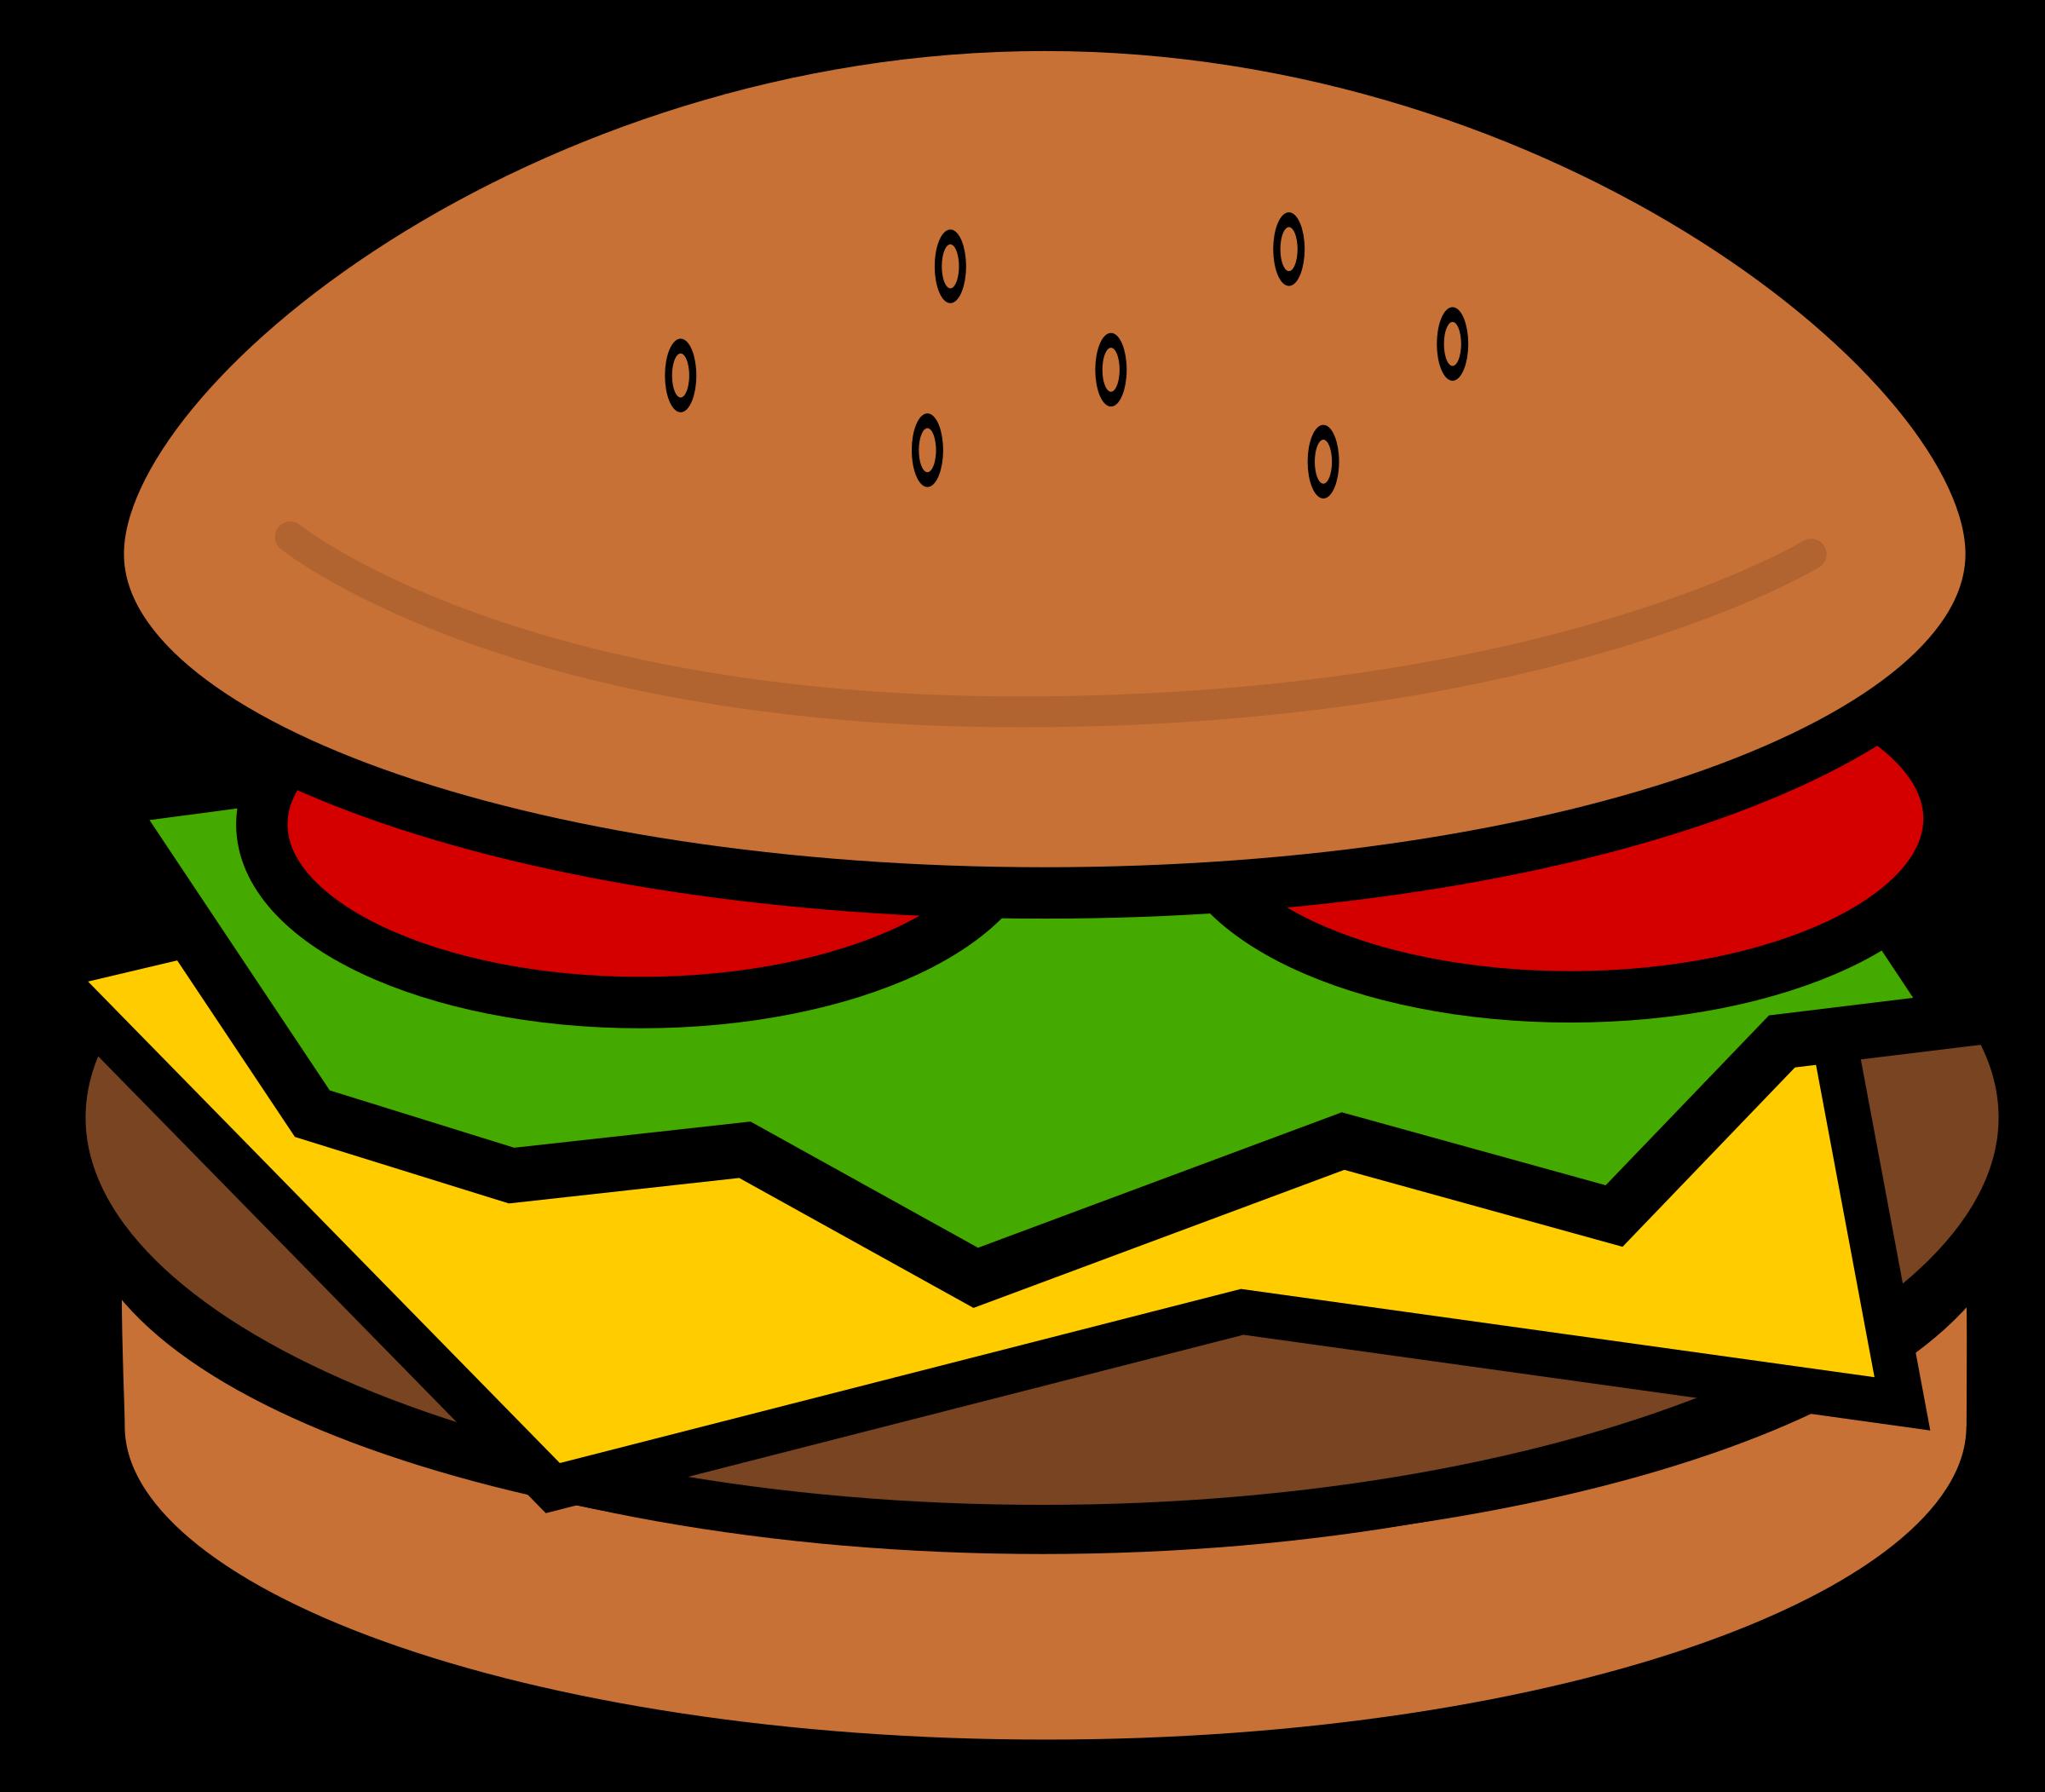 clipart hamburger rh openclipart org hamburger clip artr hamburger clip art for paragraph